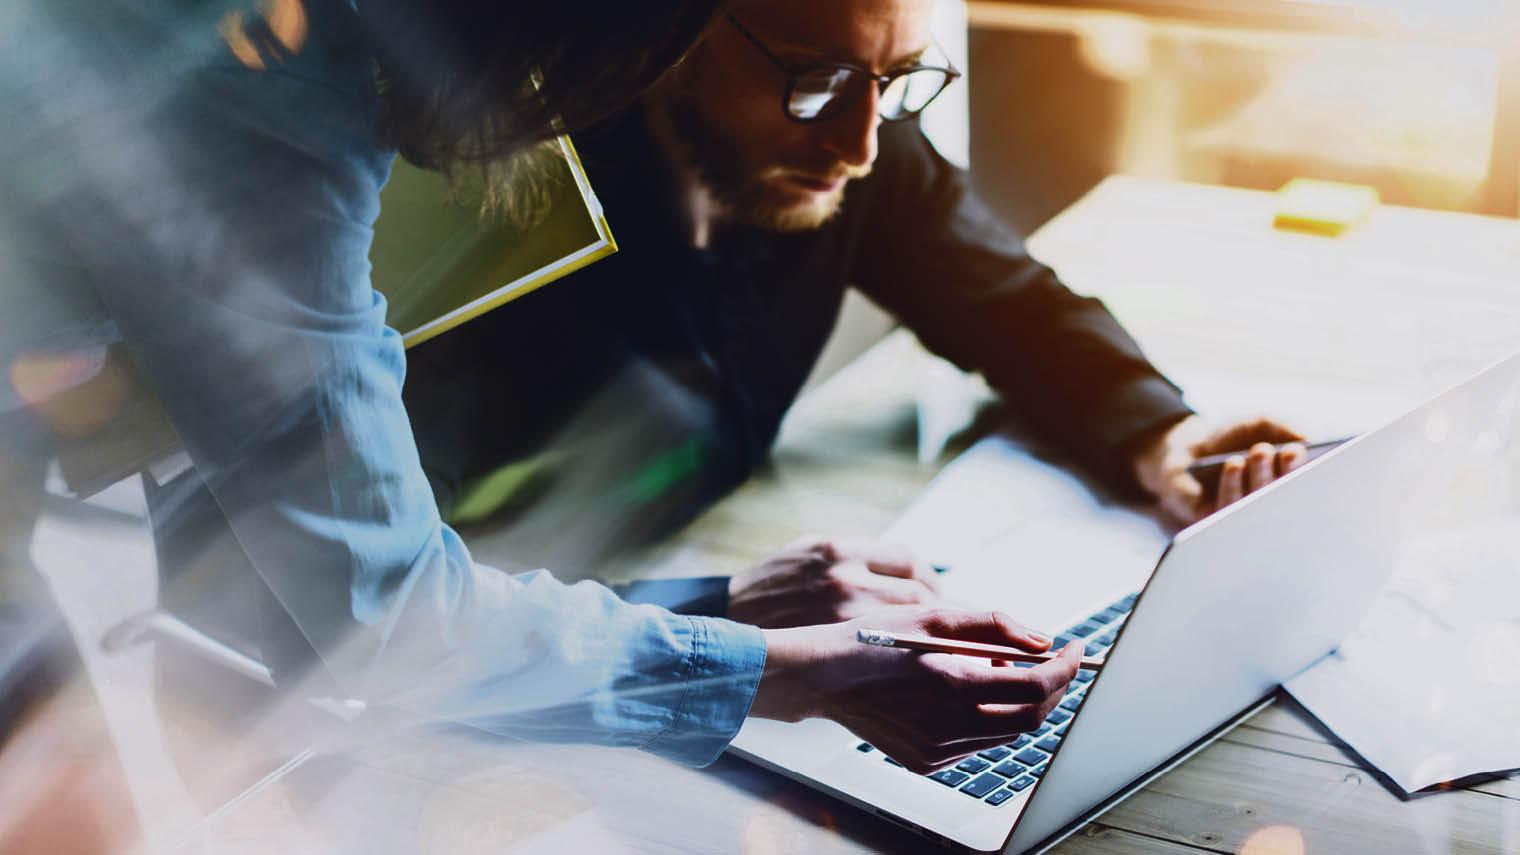 Professionals at a laptop